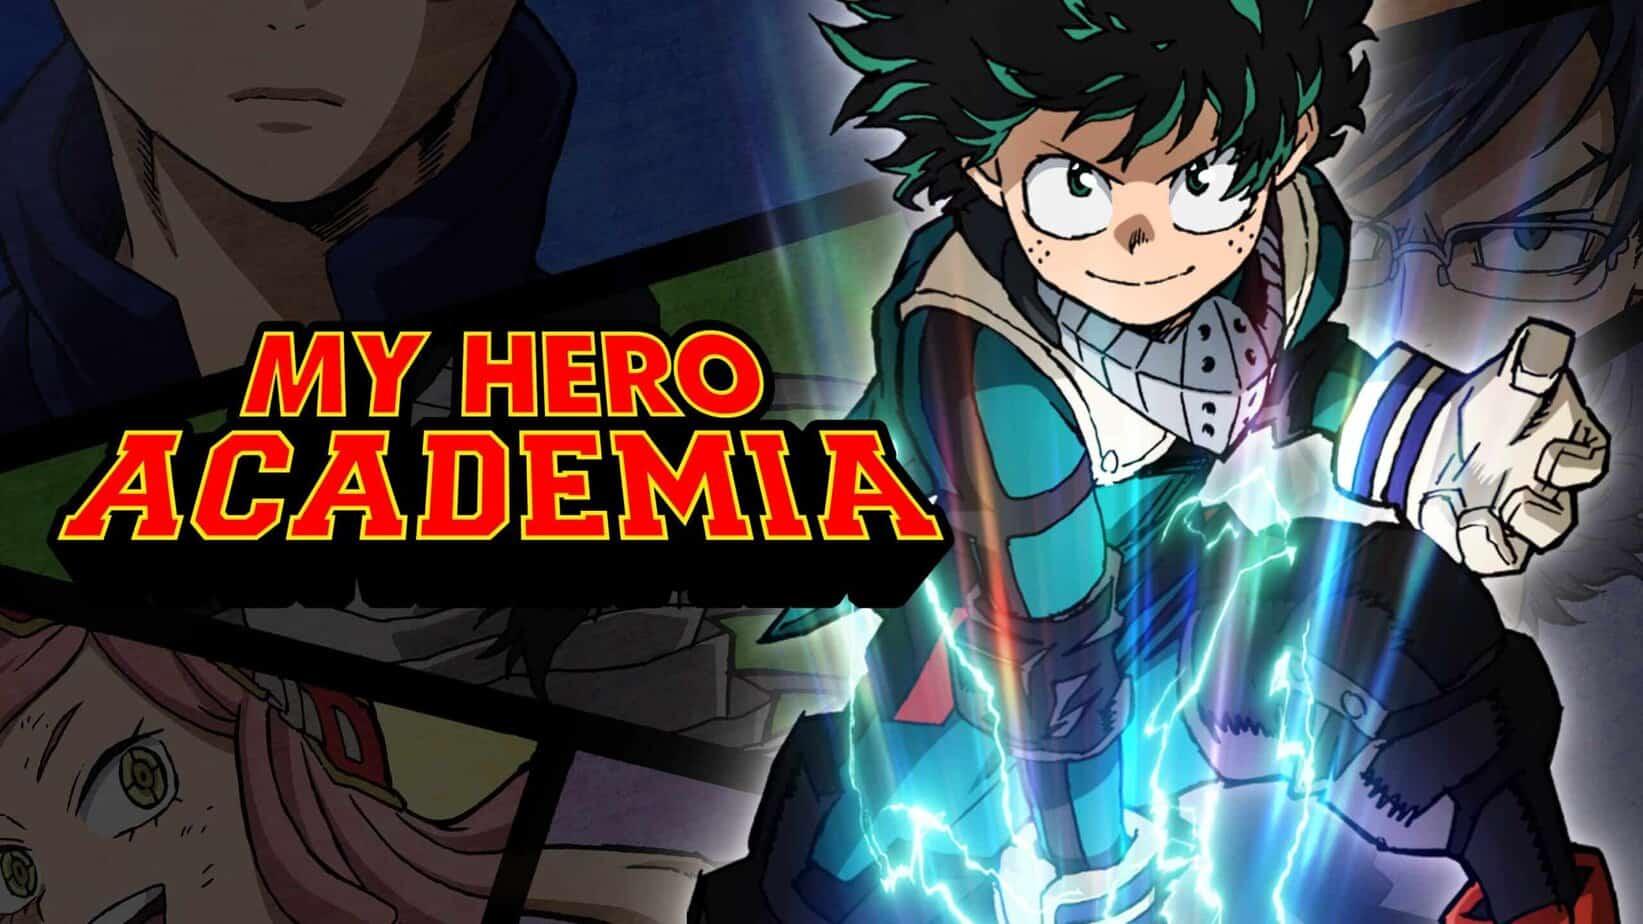 Bande annonce  My Hero Academia saison 3 2